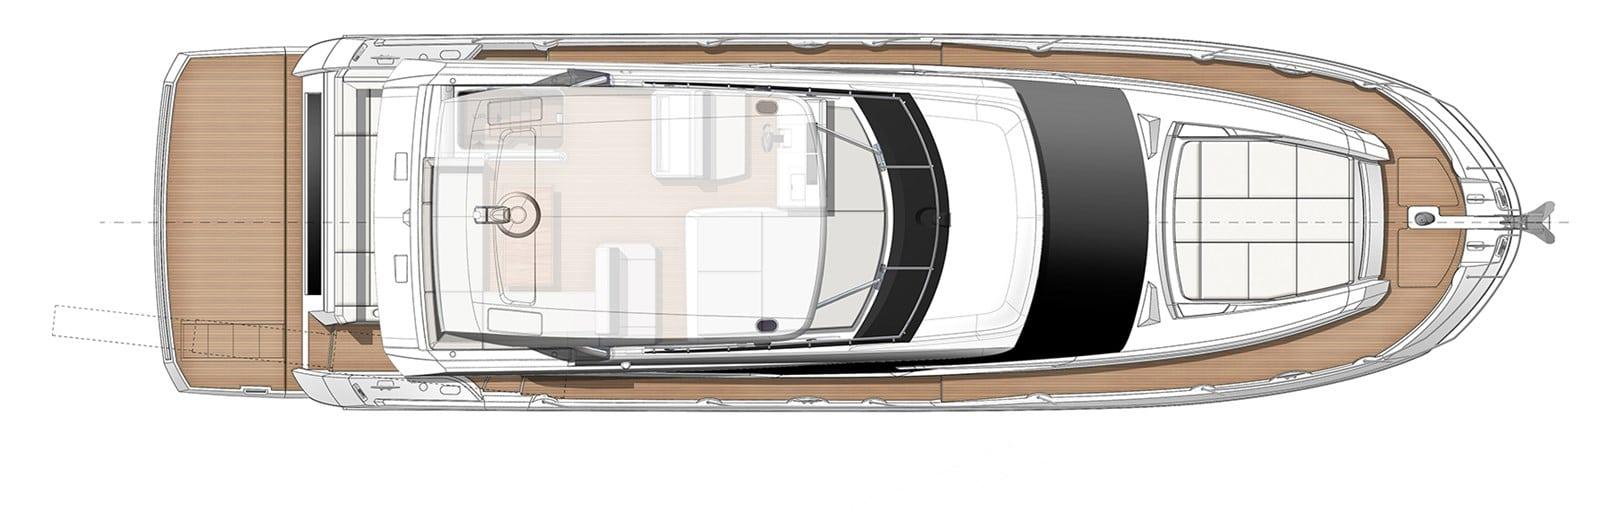 prestige yacht 520s yacht bridgelayout